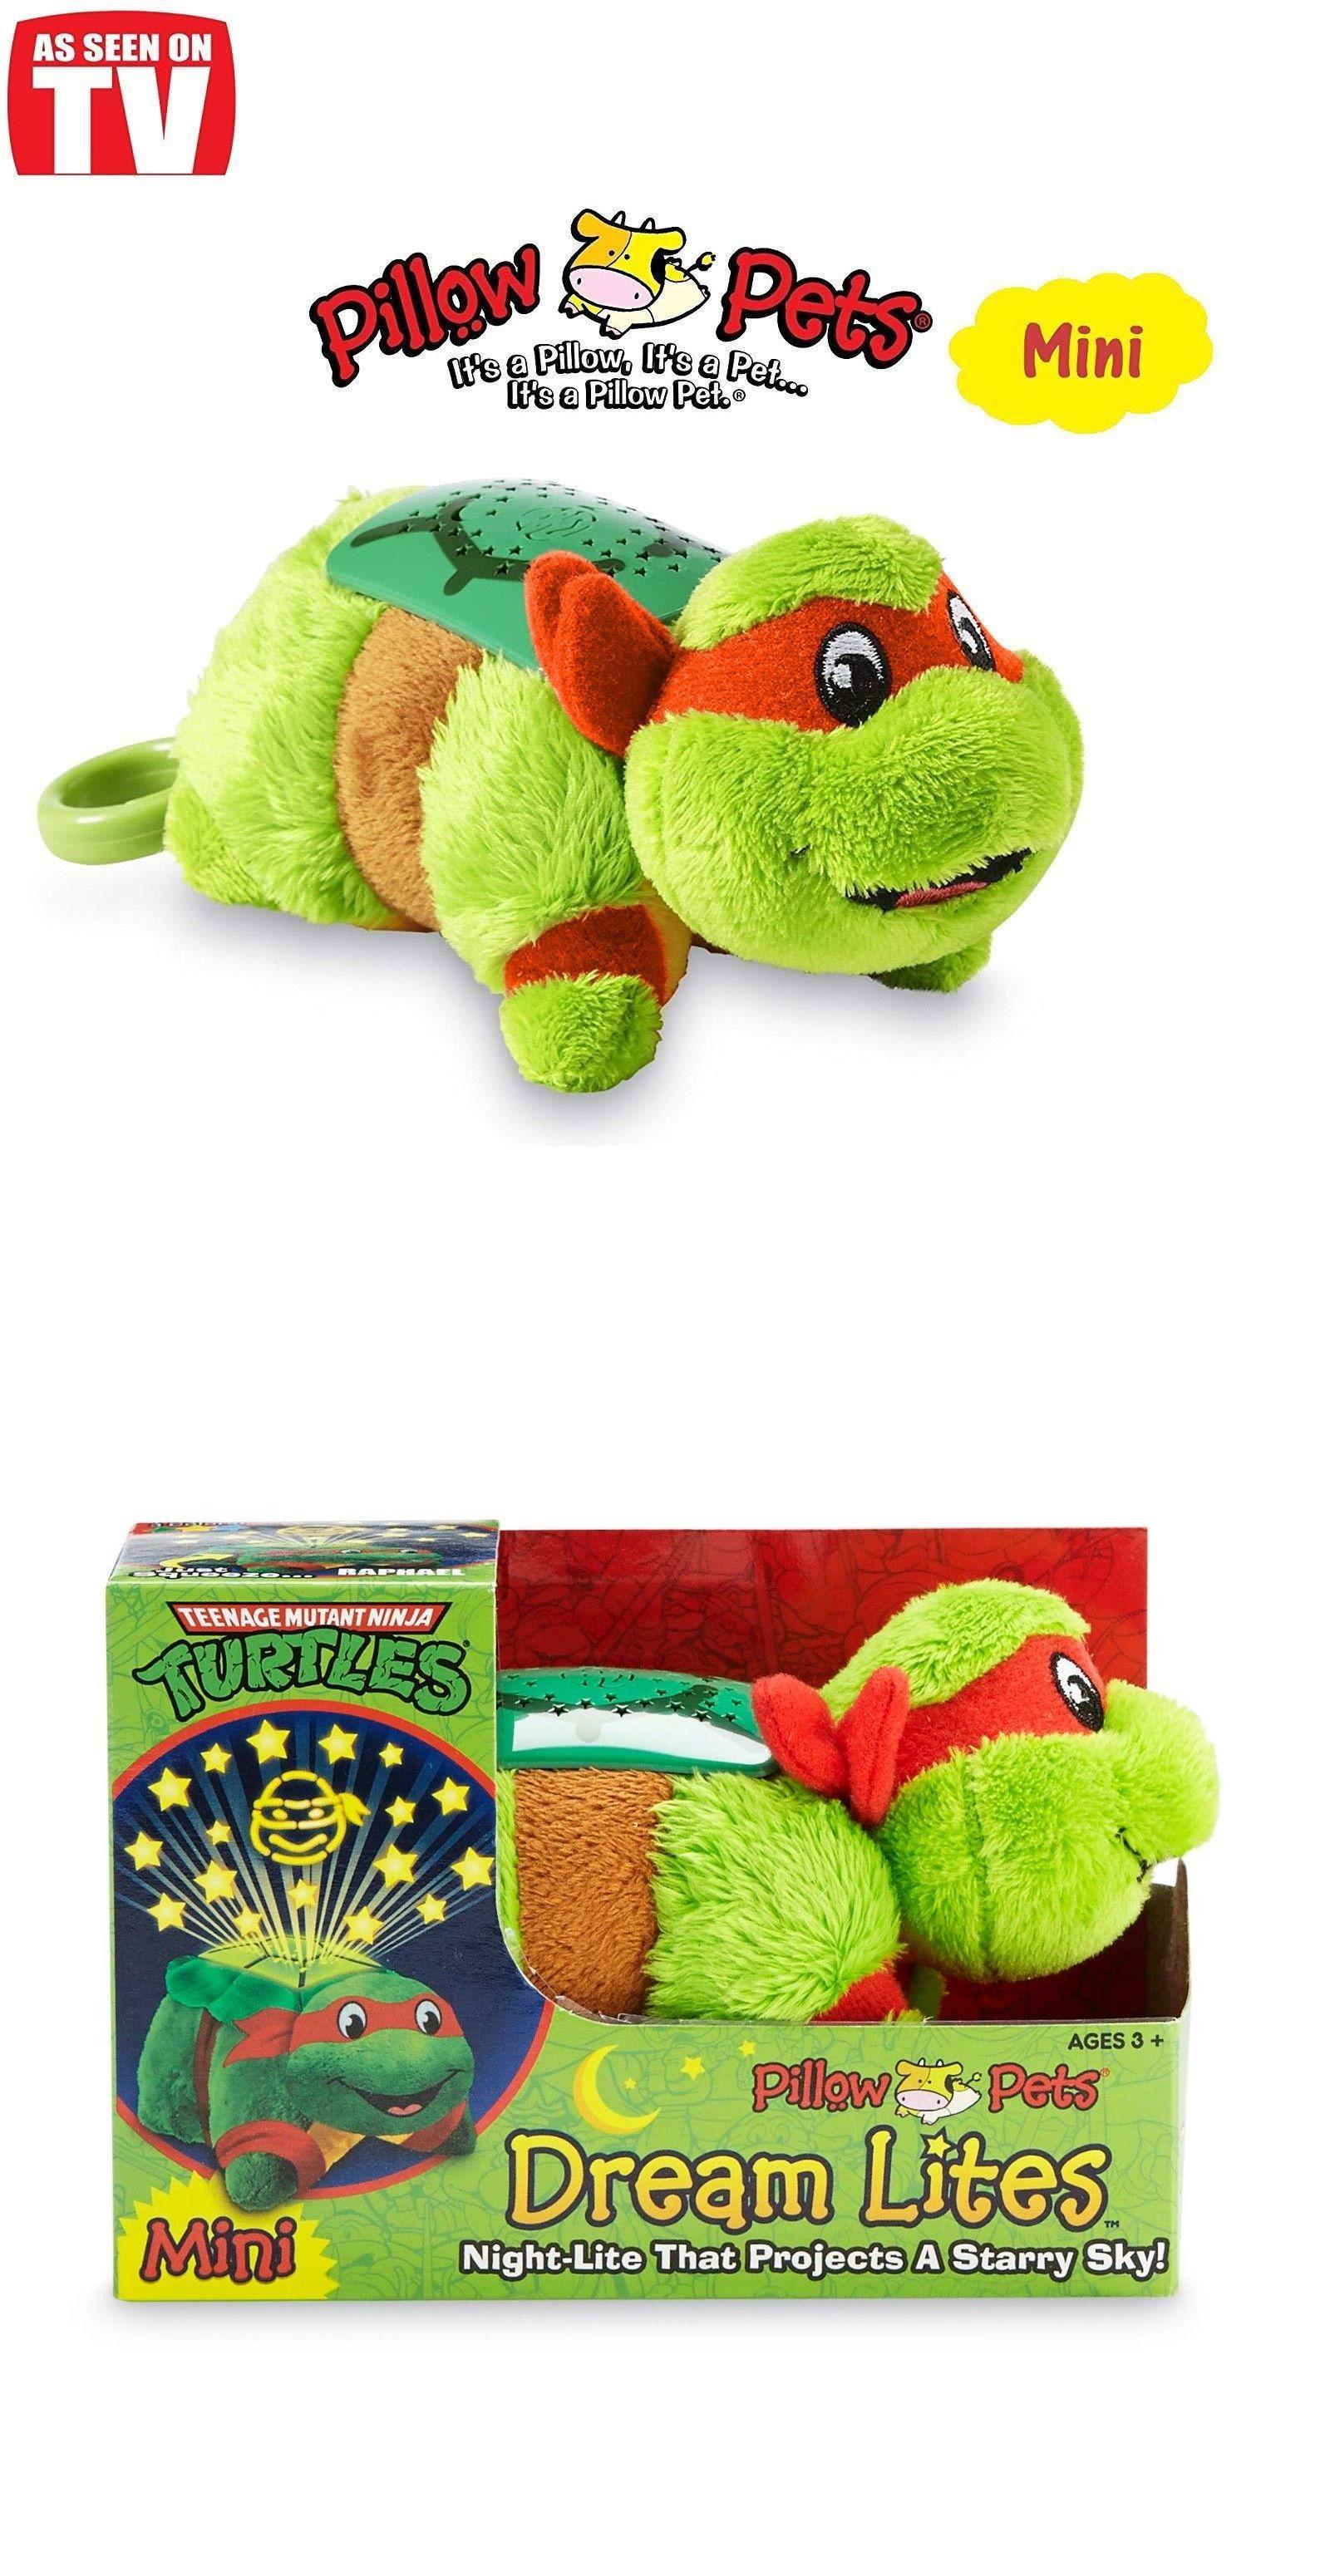 Other Toys For Baby 179013 Teenage Mutant Ninja Turtles Mini Pillow Pets Dream Lites Michelangelo Buy It No Animal Pillows Tv Pillow Donatello Ninja Turtle